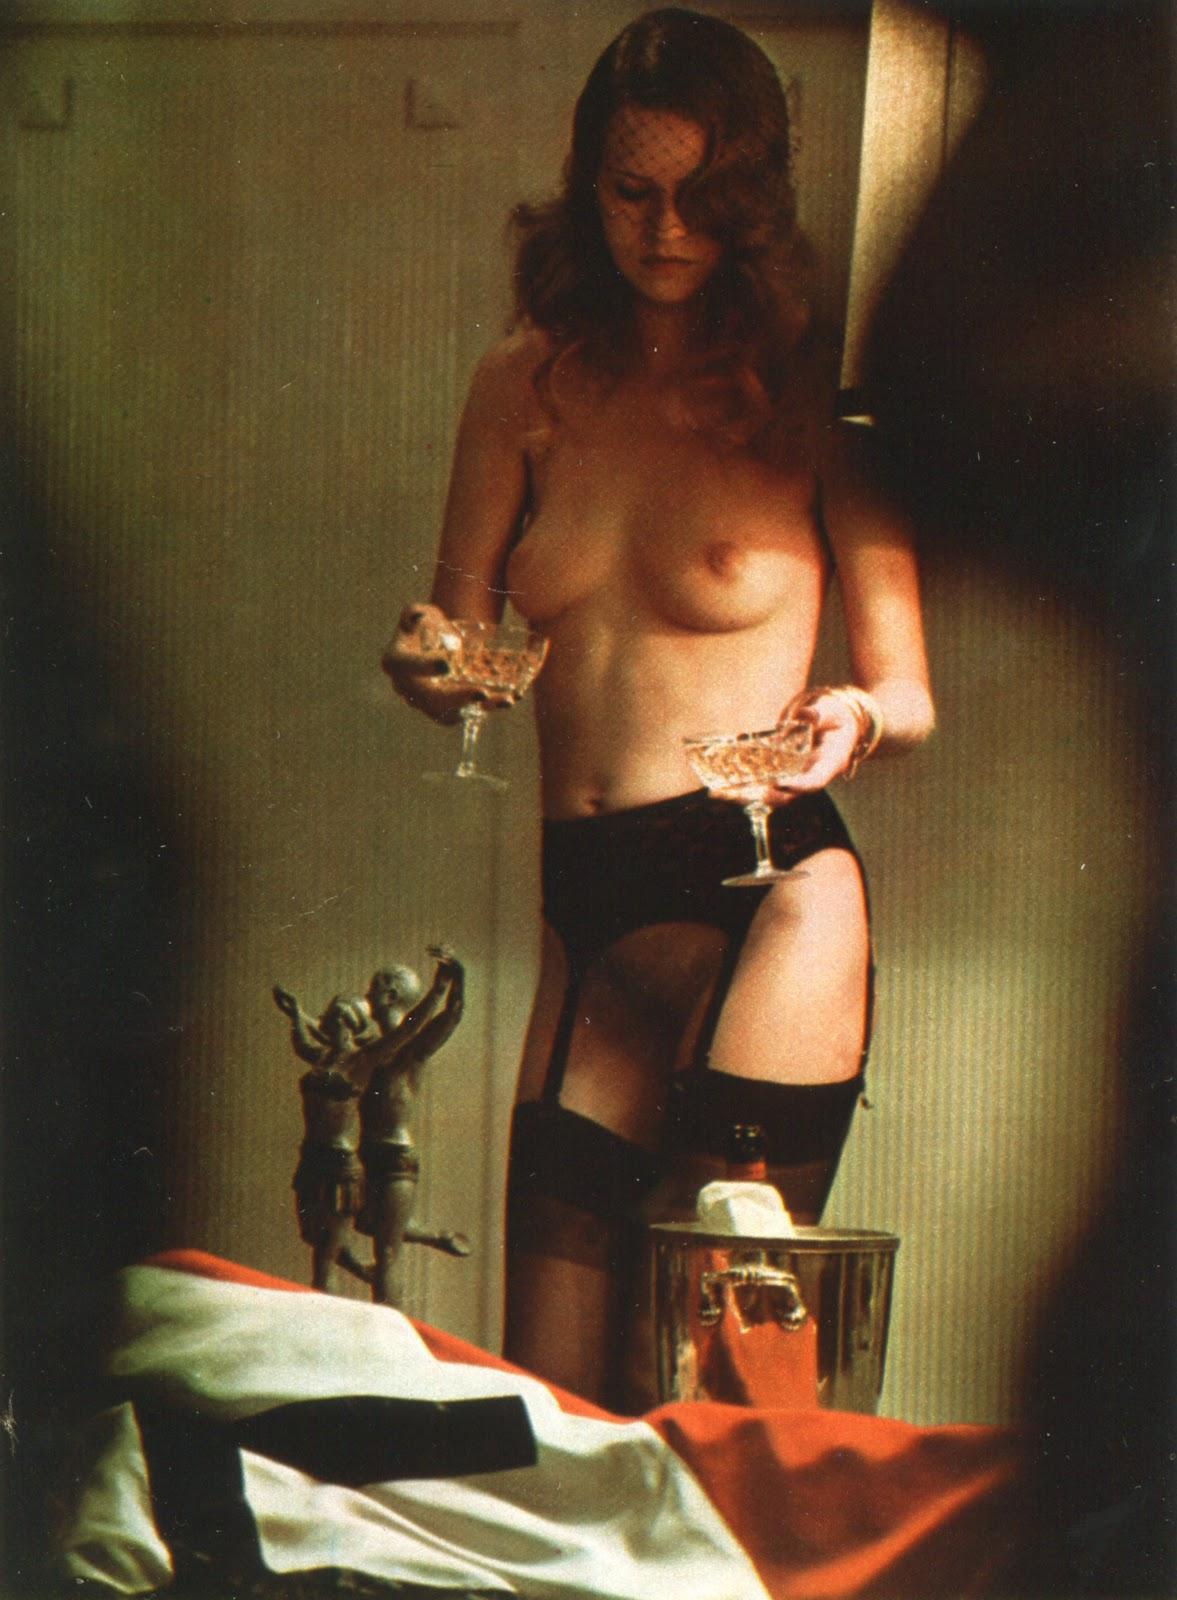 http://2.bp.blogspot.com/-YrlqqKp5SVc/T5q3BoSustI/AAAAAAAACoo/9UHzGZpHYzs/s1600/Teresa+Ann+Savoy+%285%29.jpg